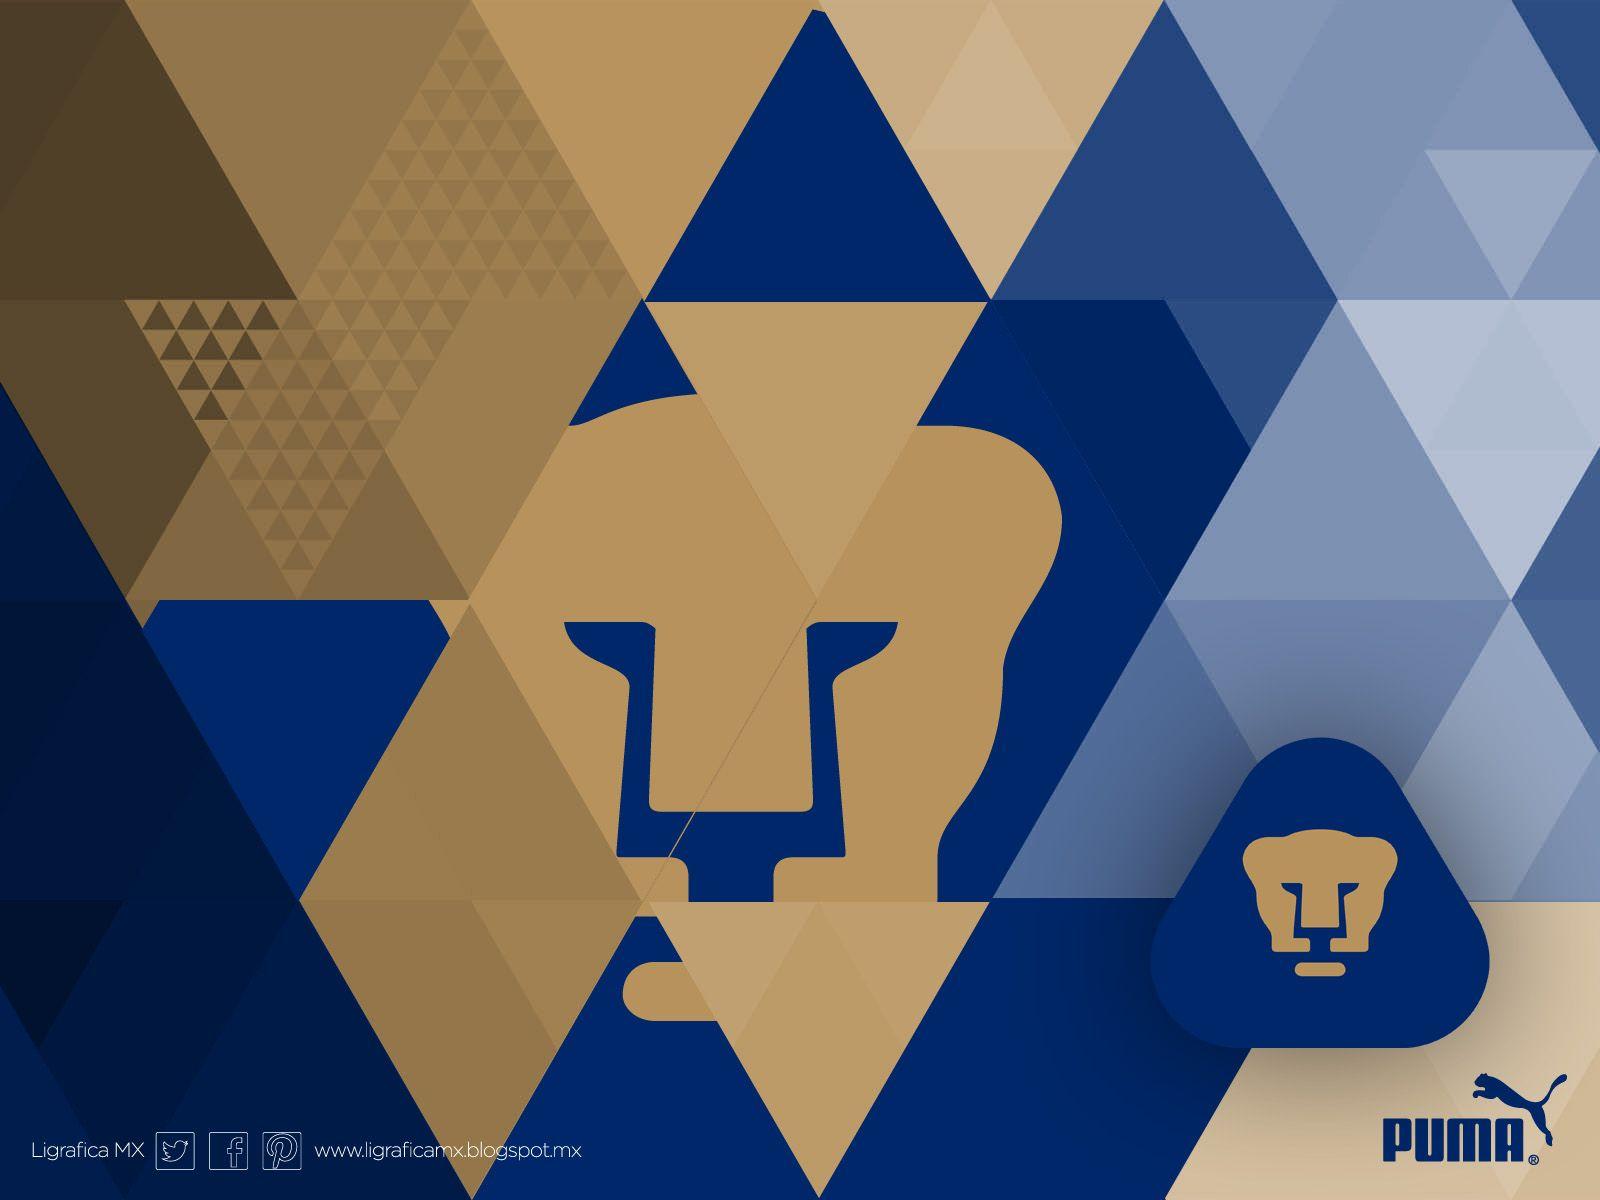 pumas unam • • ligraficamx 021213ctg(2) | pumas wallpaper